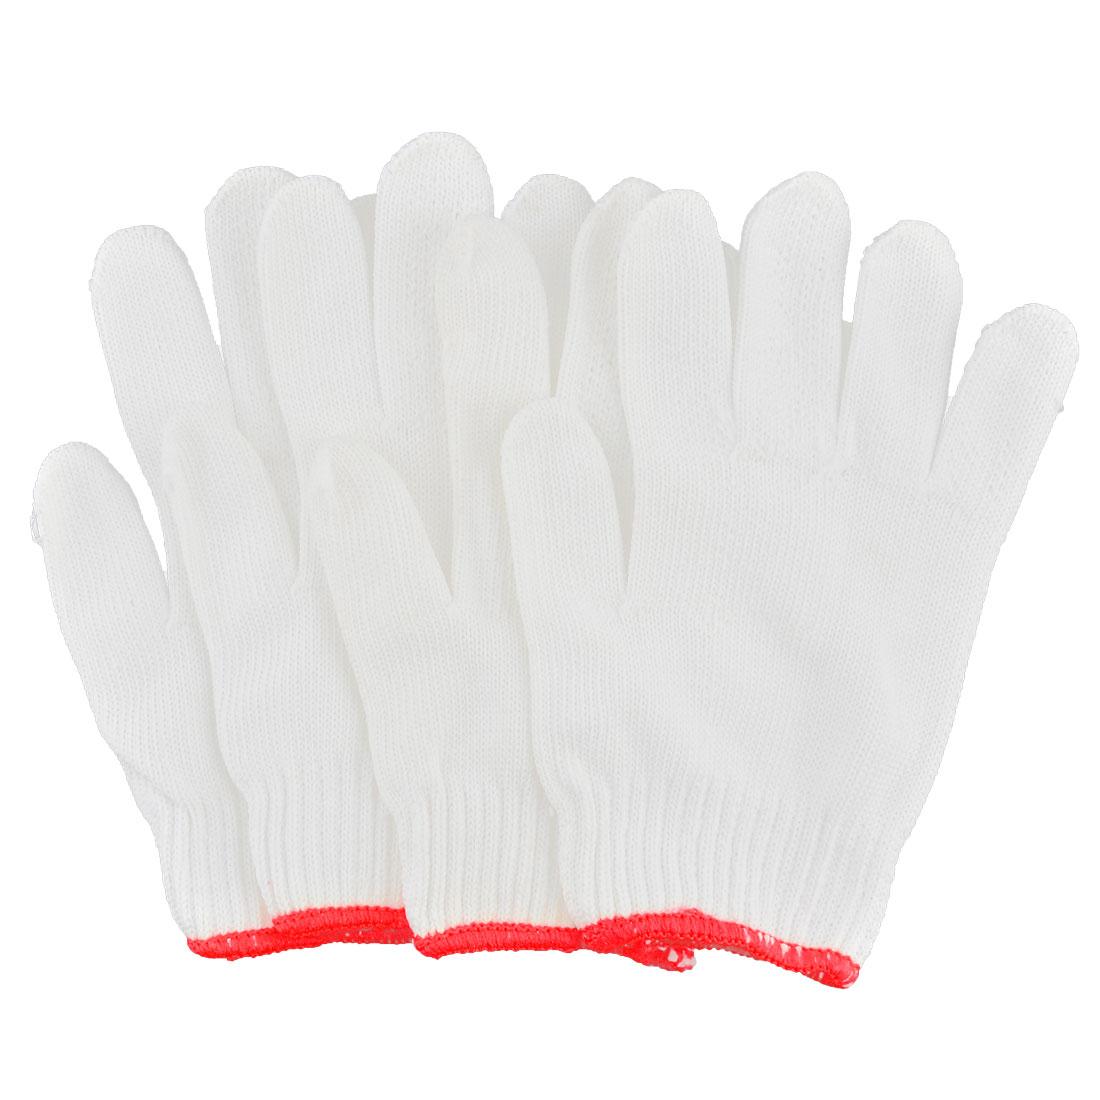 Carpenter Electrician Cotton Blends Stretch Cuff Working Gloves White 4 Pcs